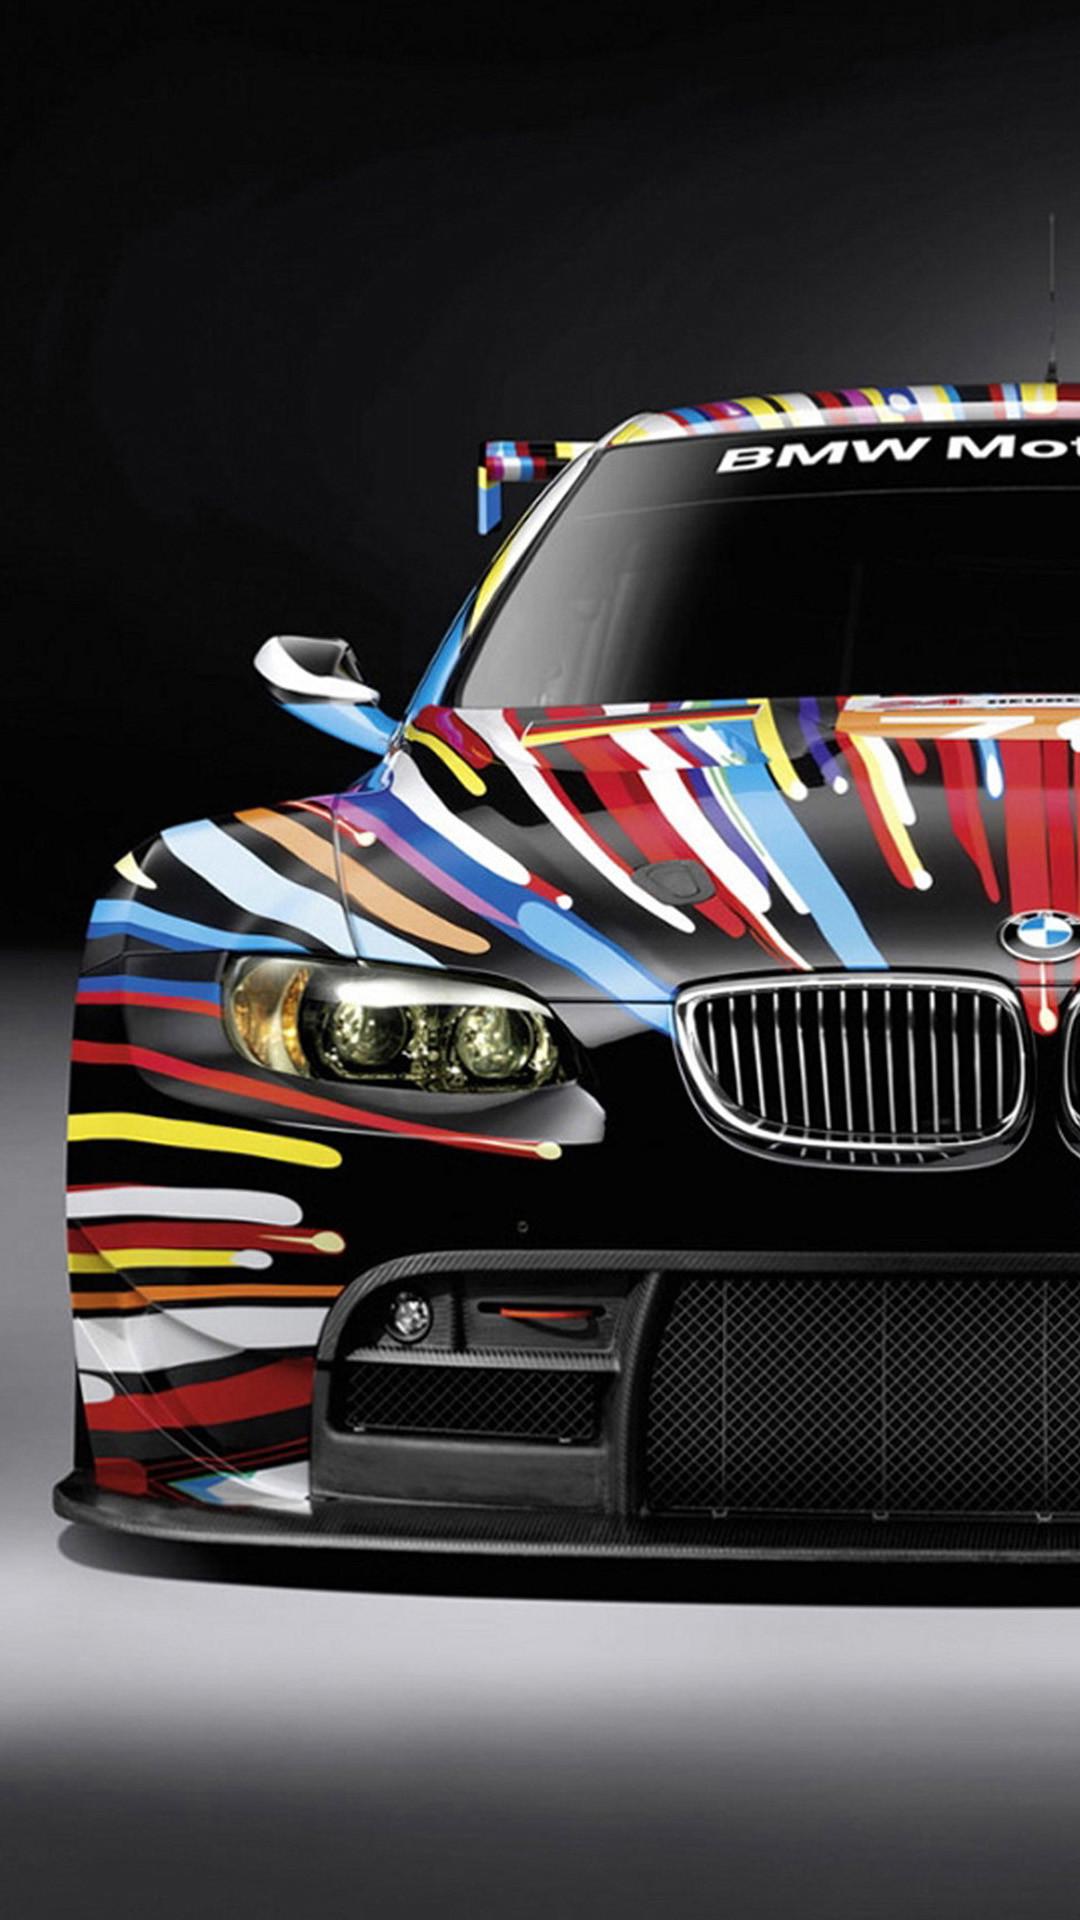 Car Wallpapers For iPhone 6 Plus 120.jpg (1080×1920)